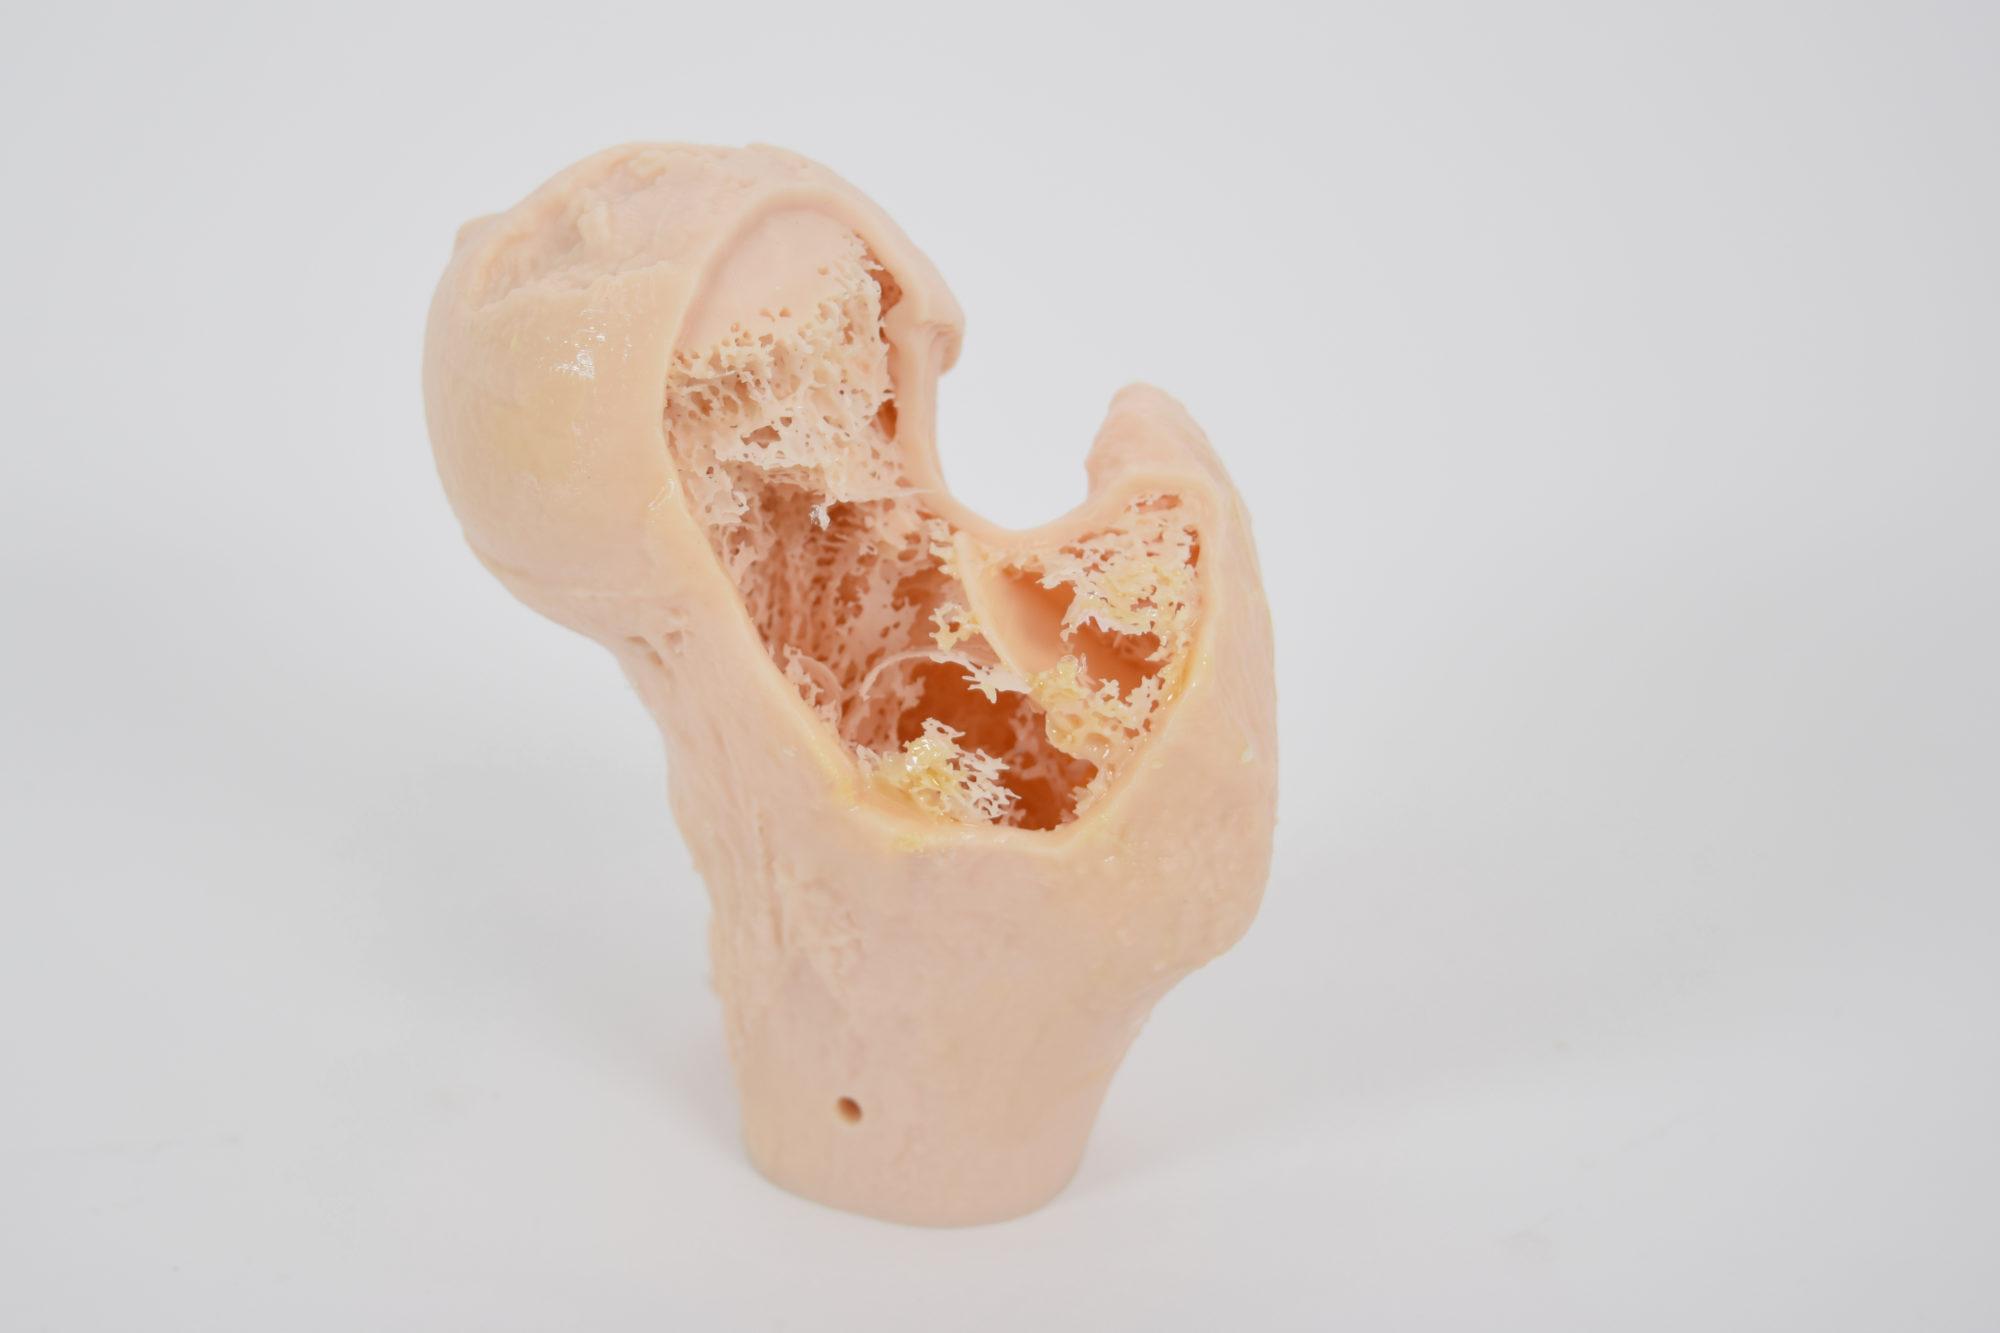 Osteoprorotic models